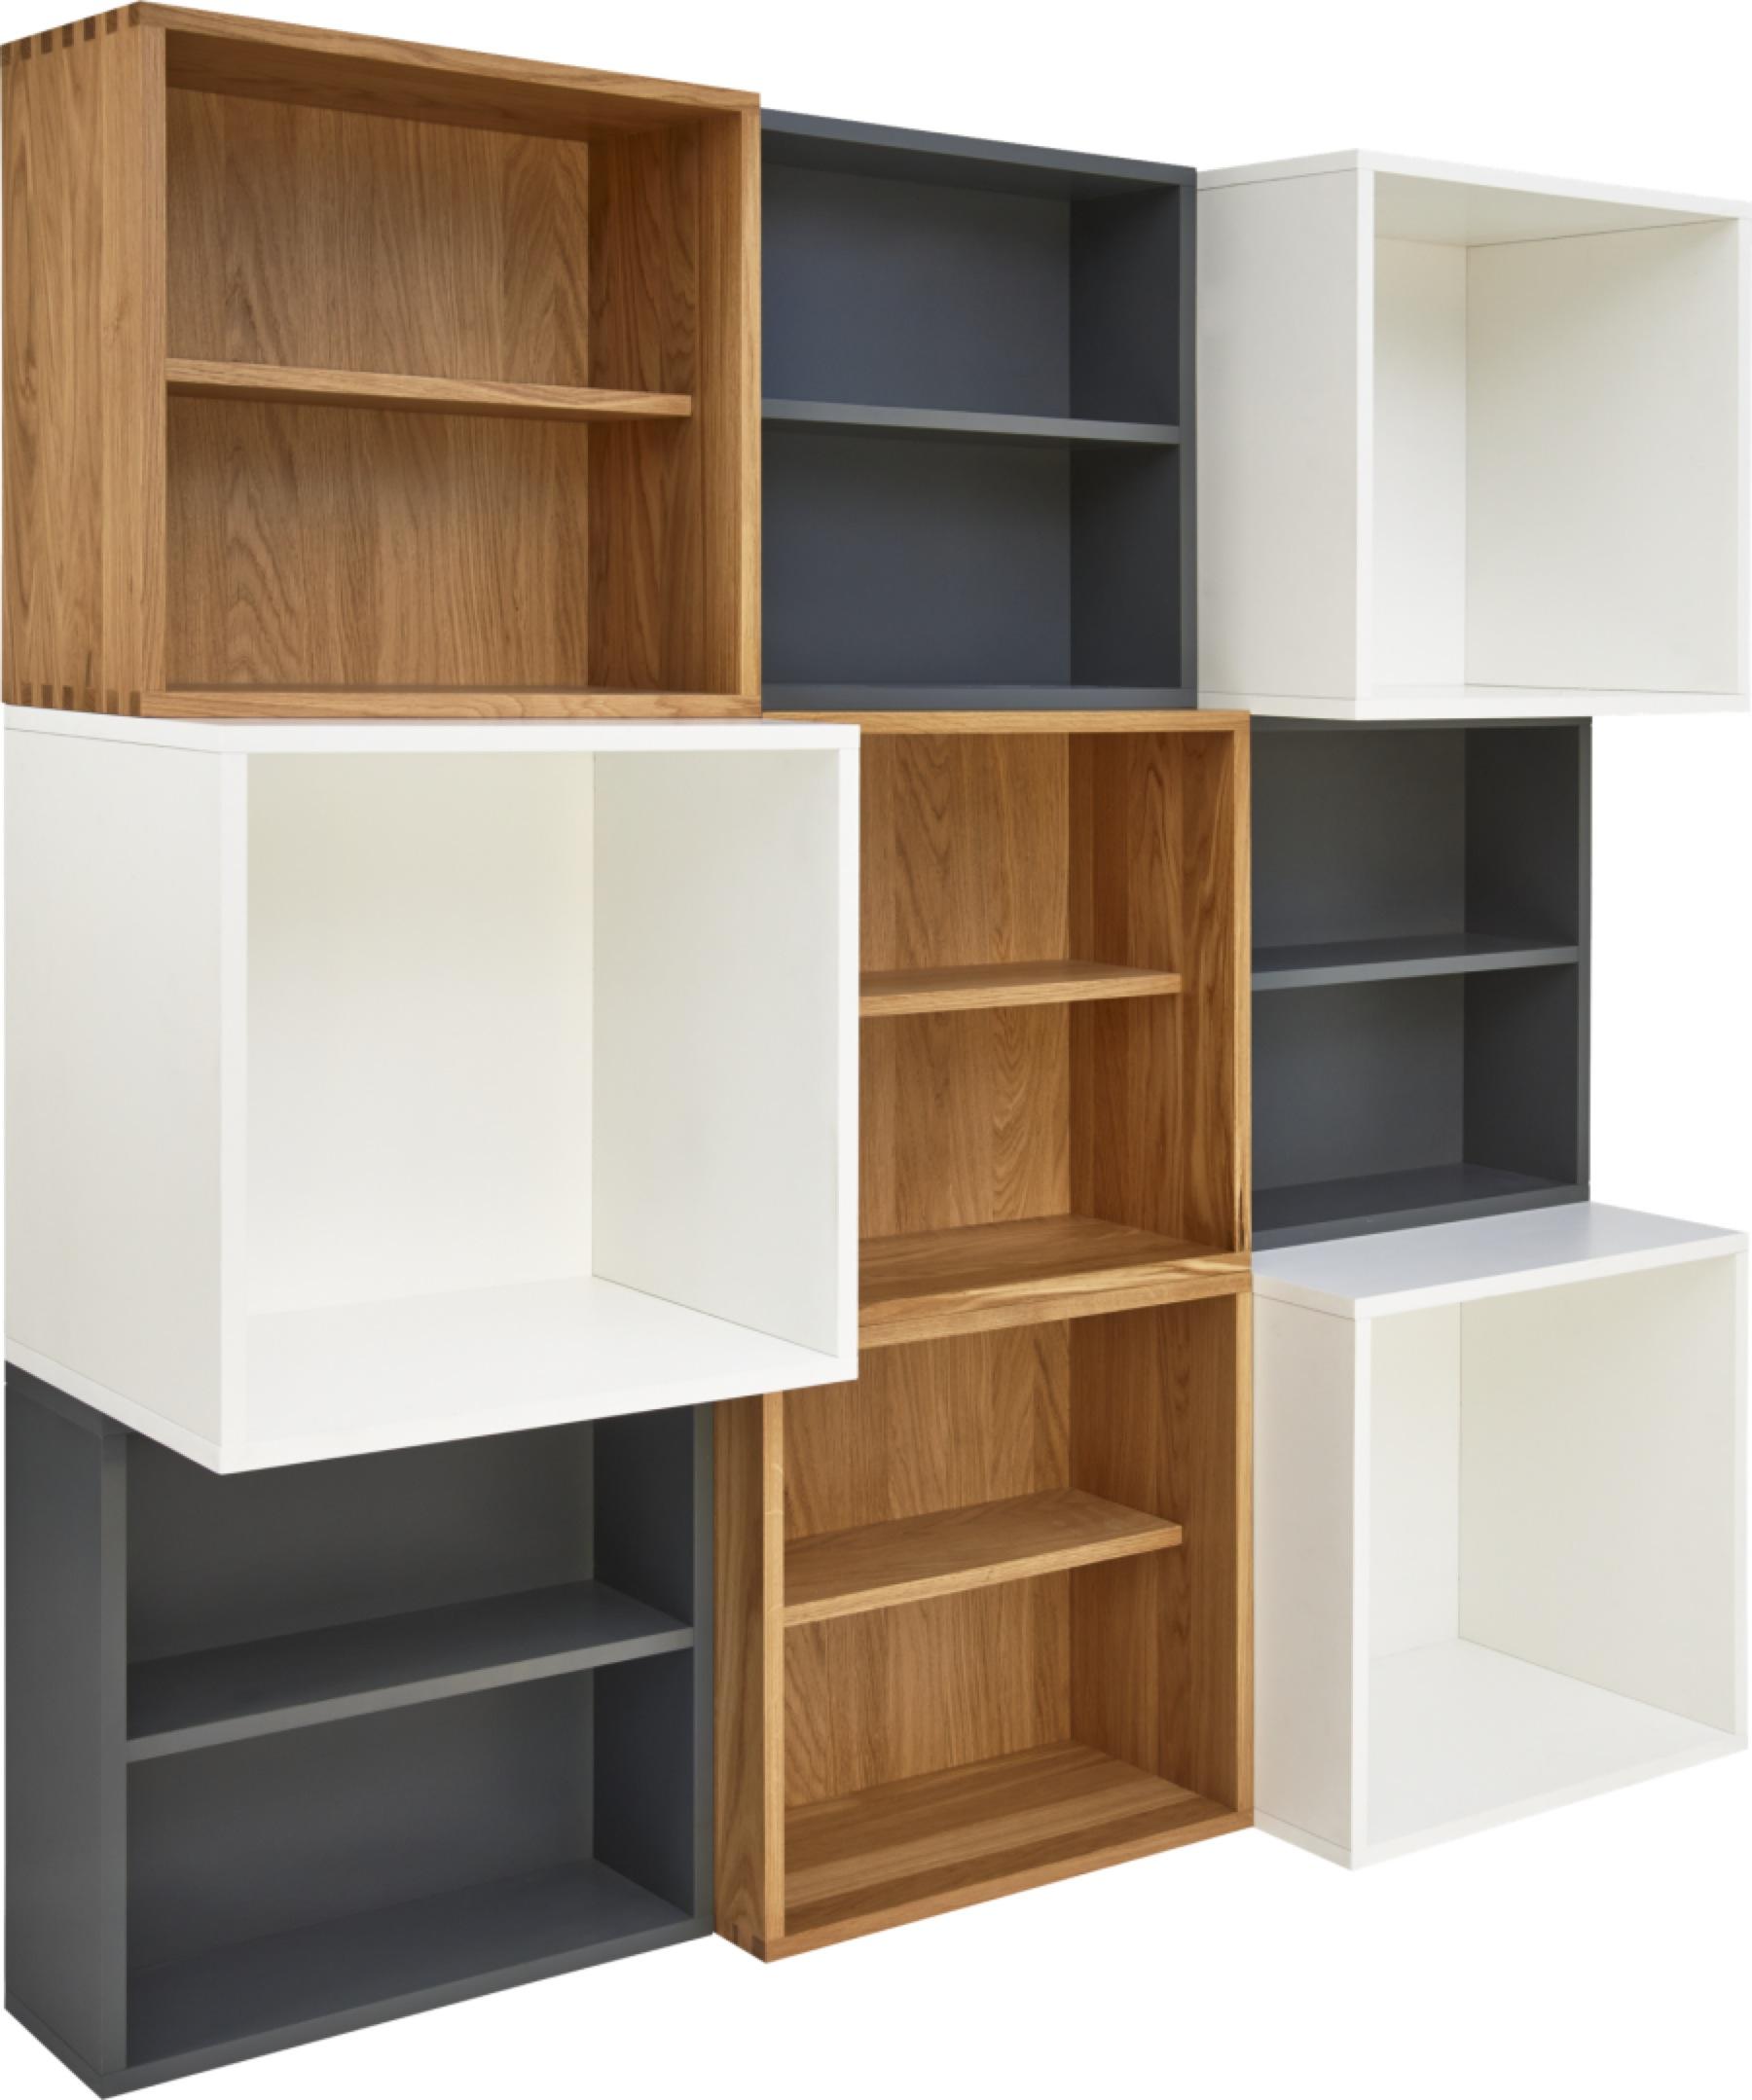 rangement modulaire brick habitat. Black Bedroom Furniture Sets. Home Design Ideas